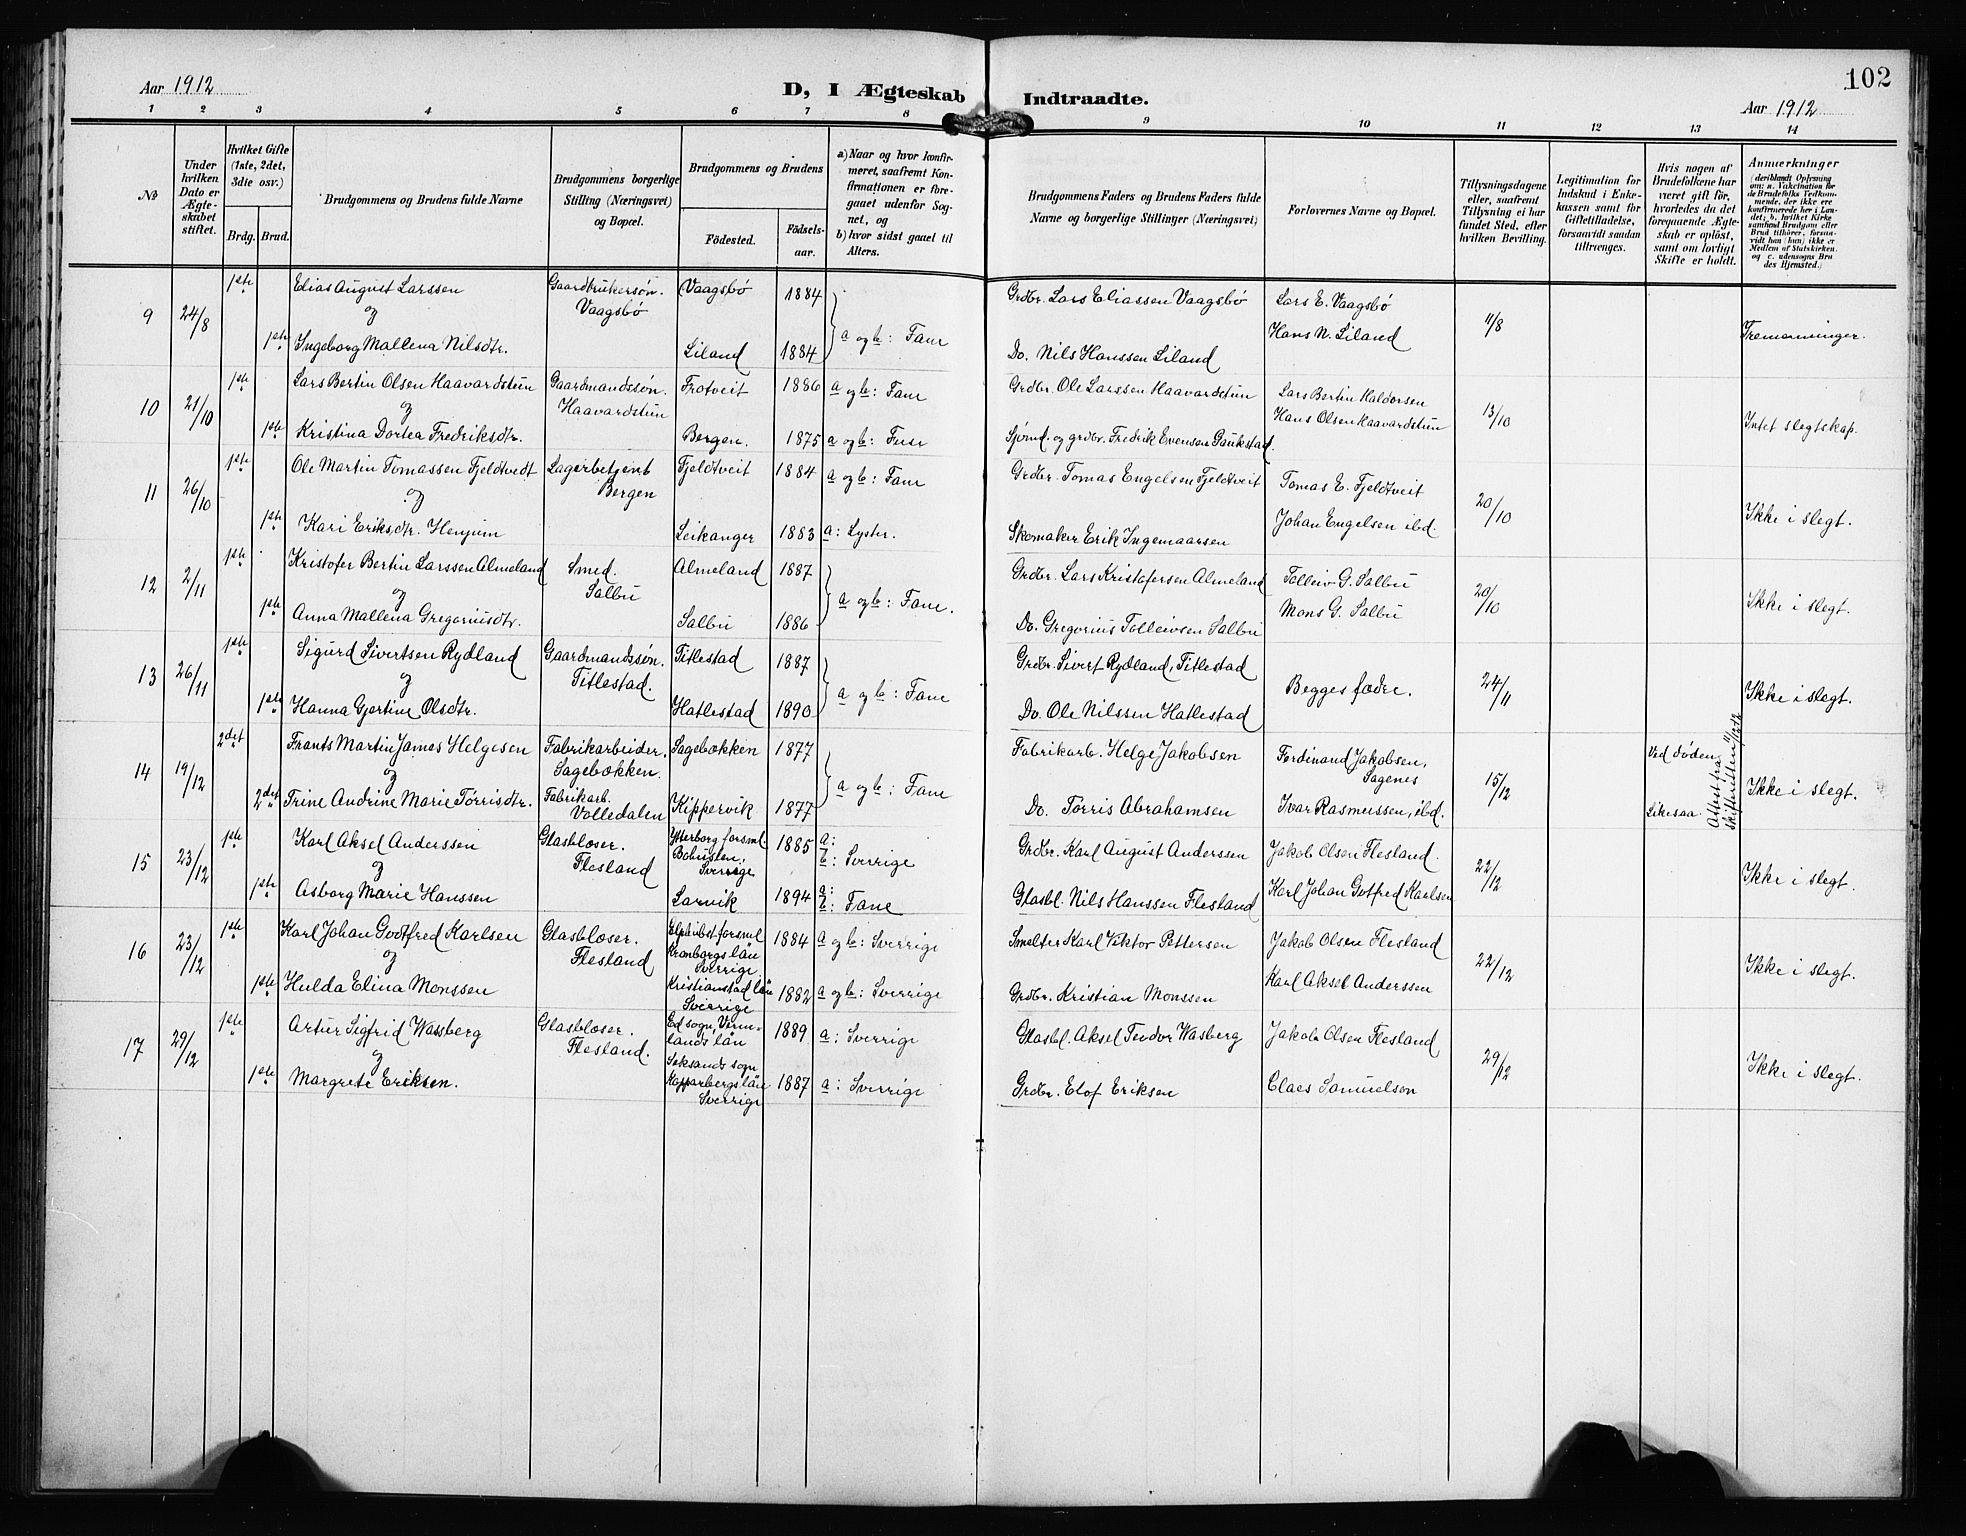 SAB, Fana Sokneprestembete, H/Hab: Klokkerbok nr. B 4, 1902-1912, s. 102